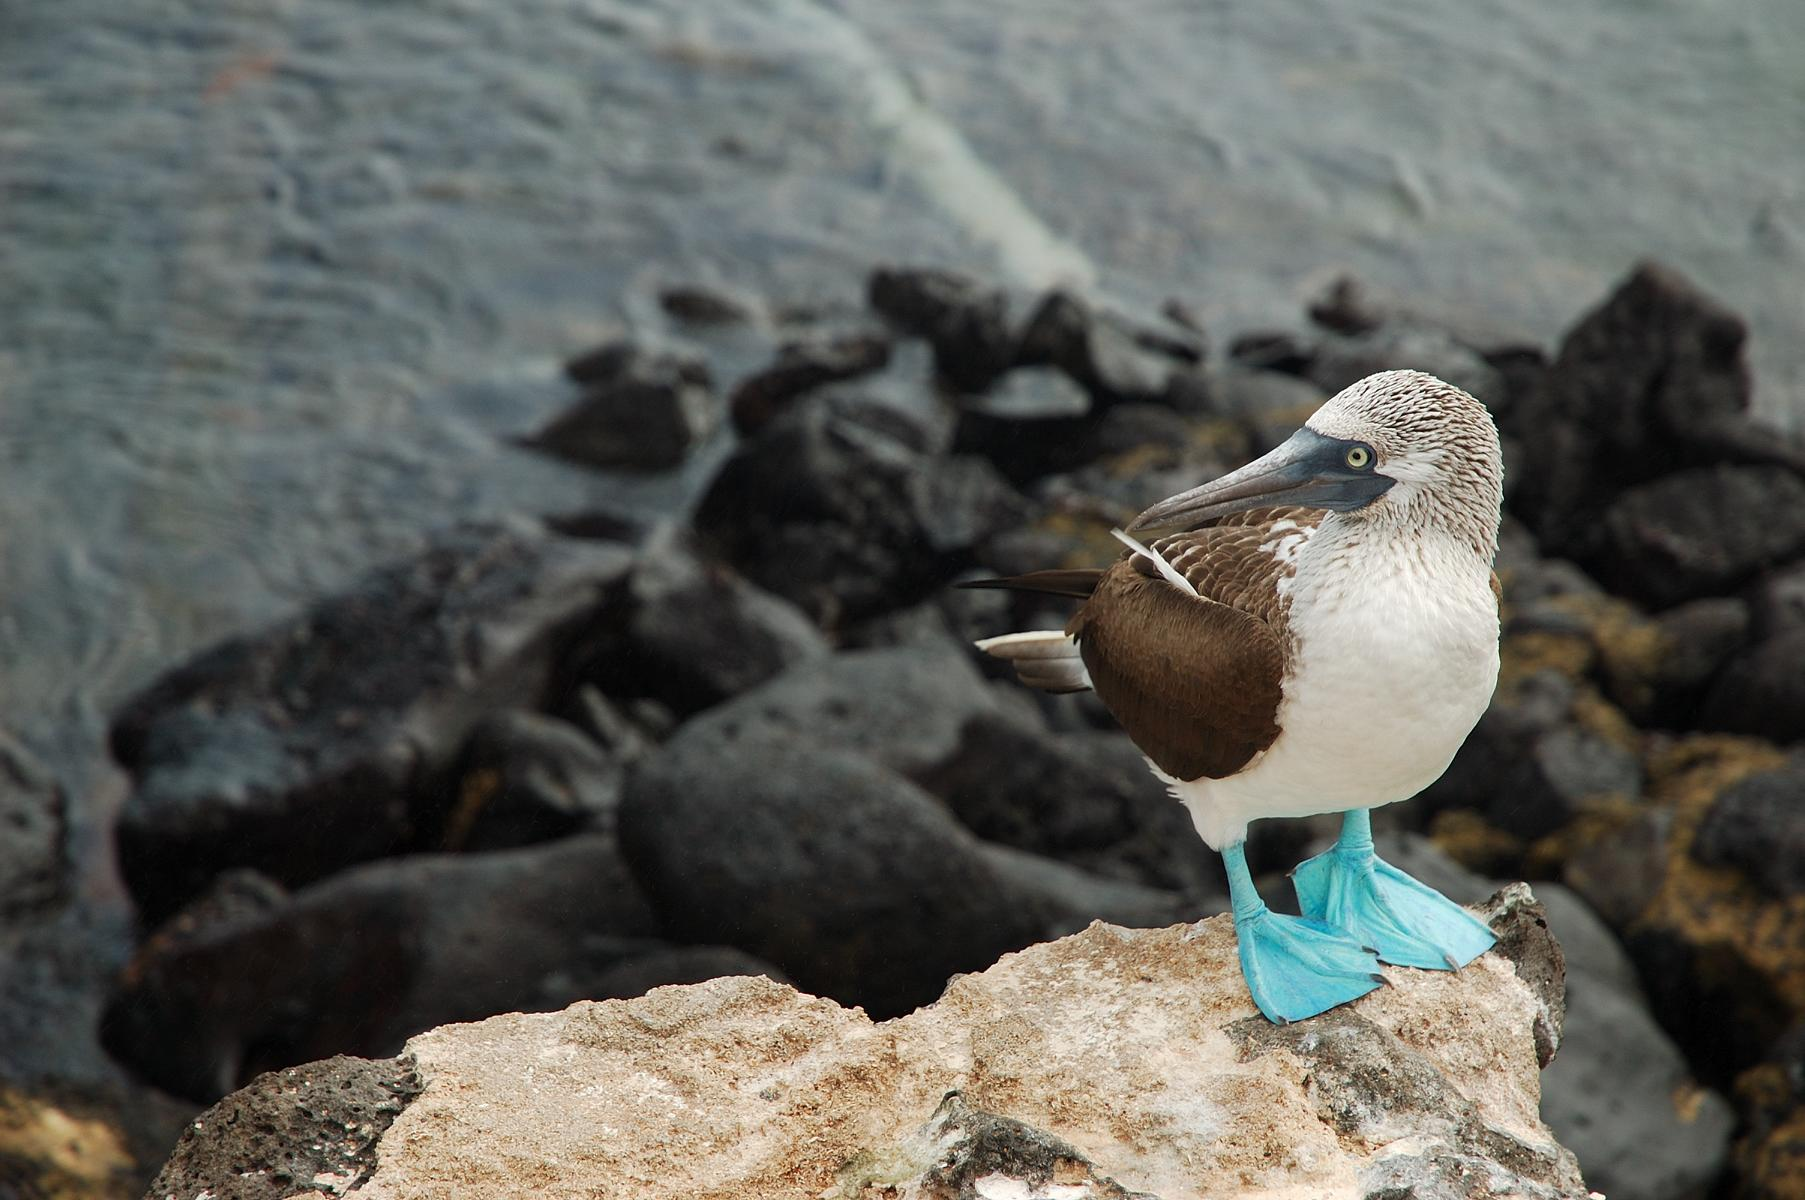 Rundreise - K1600_Galapagos-Ecuador-Blue-Footed-Booby-shutterstock_811635.jpg